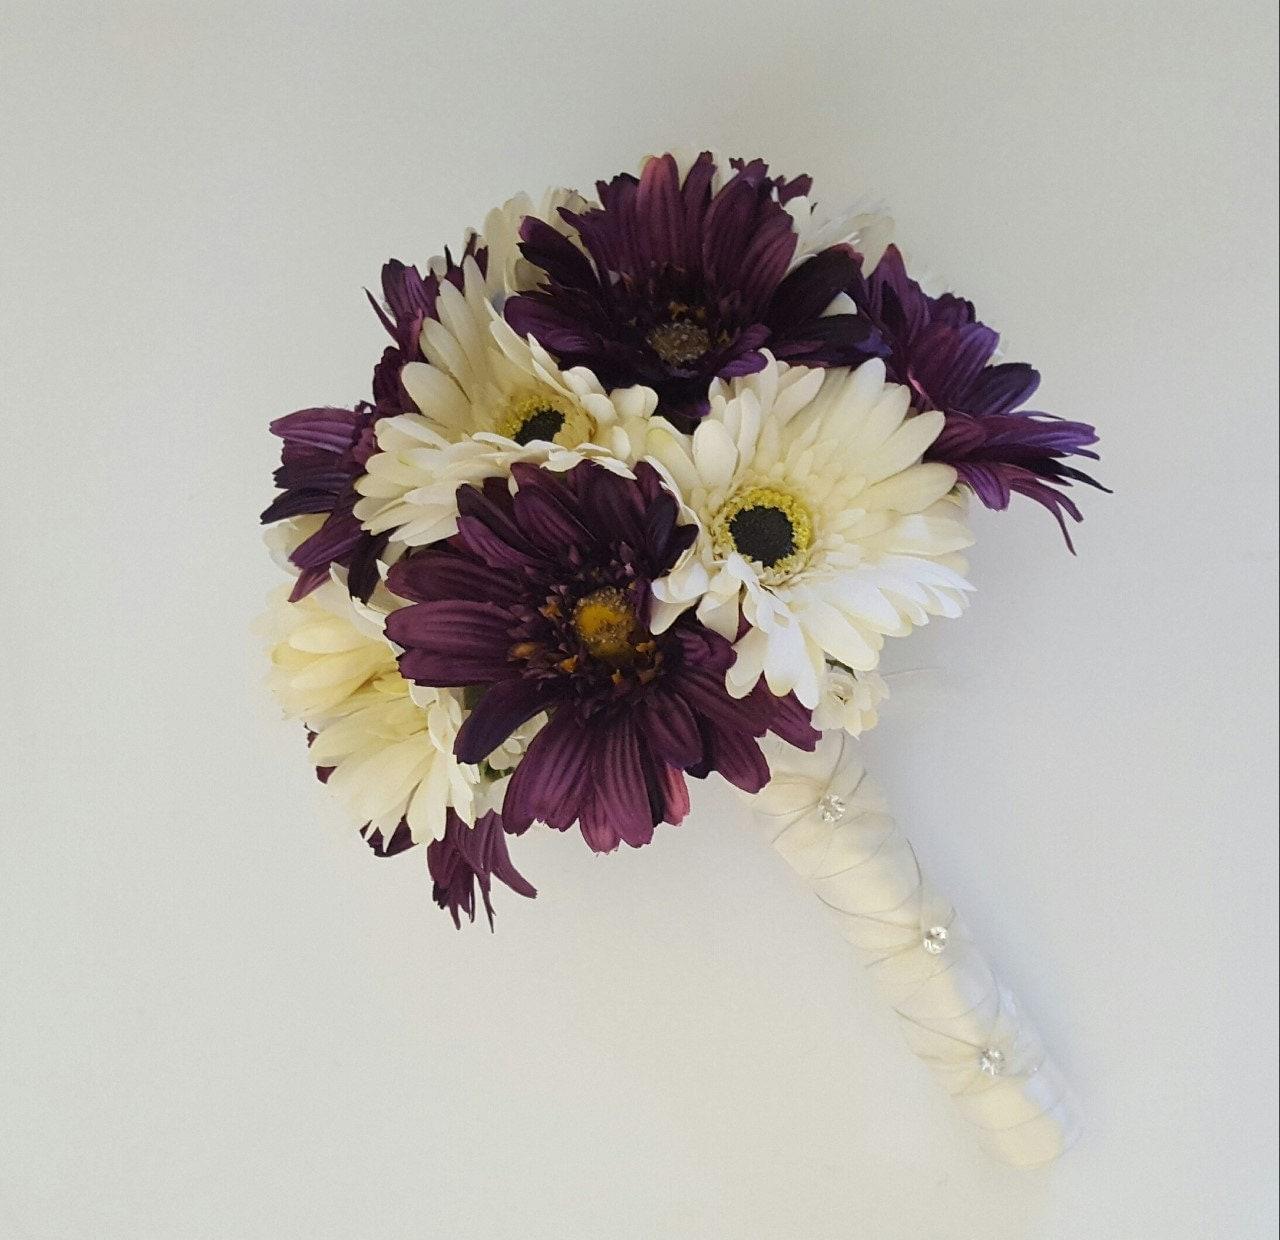 Gerbera Flower Wedding Bouquets: Eggplant Gerbera Daisy Bridal Bouquet Purple Wedding Bouquet